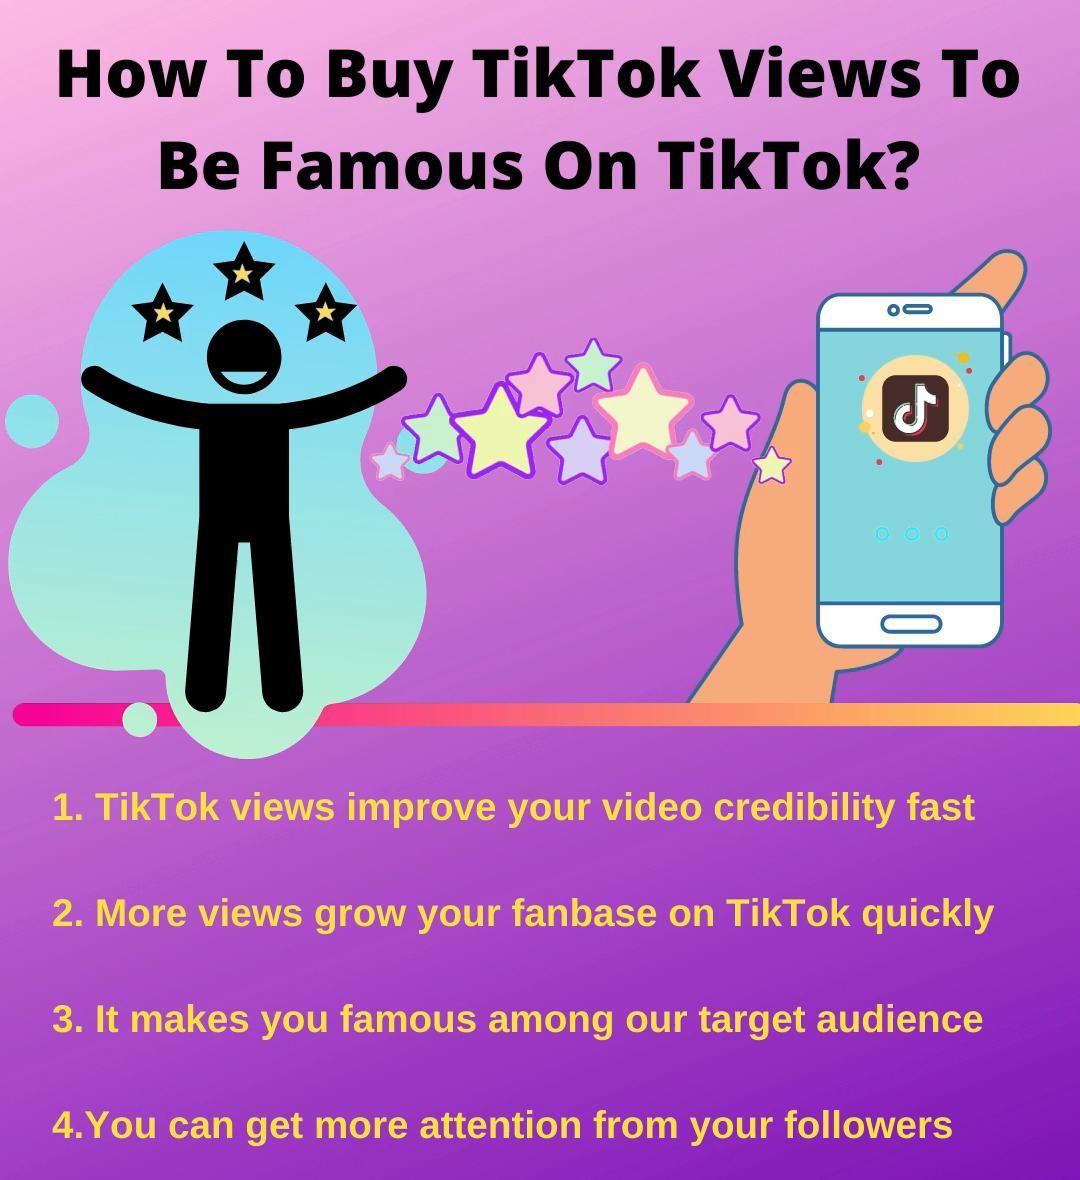 How To Buy Tiktok Views To Be Famous On Tiktok Video Social Media Social Media Services Music Videos